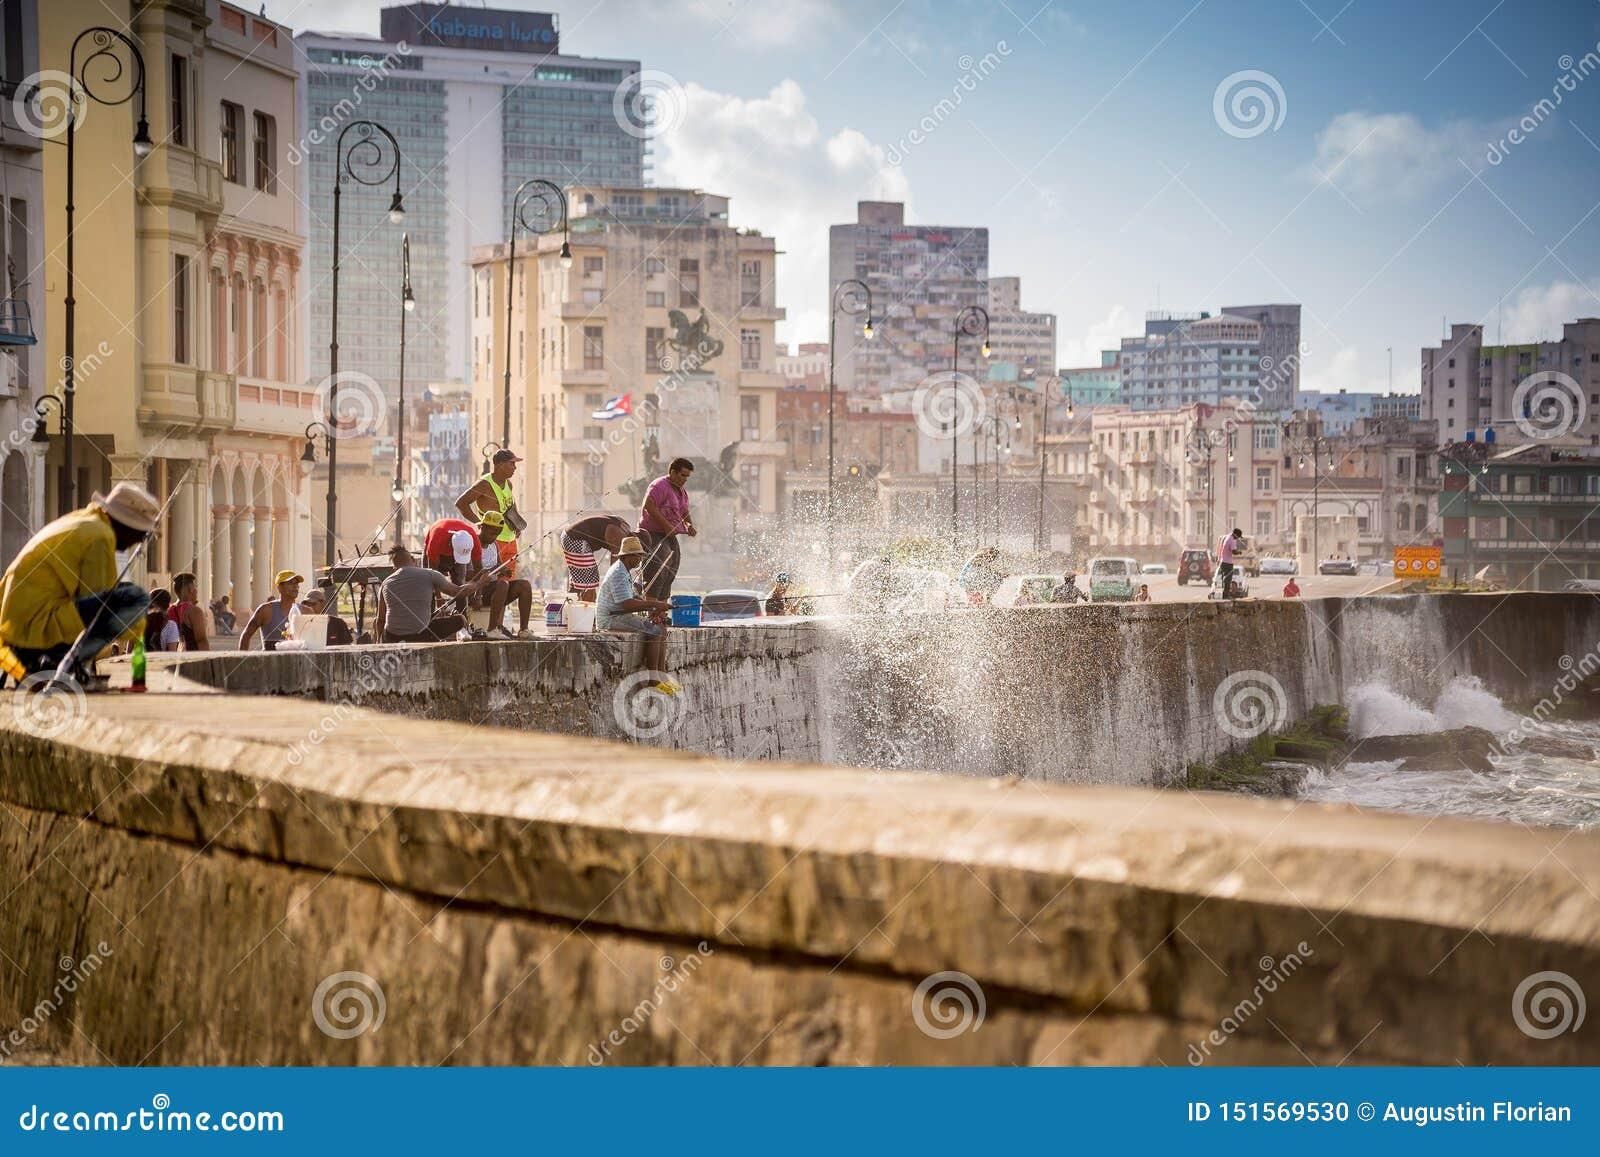 Havana, Cuba - November 29, 2017: Fishermen on Malecon